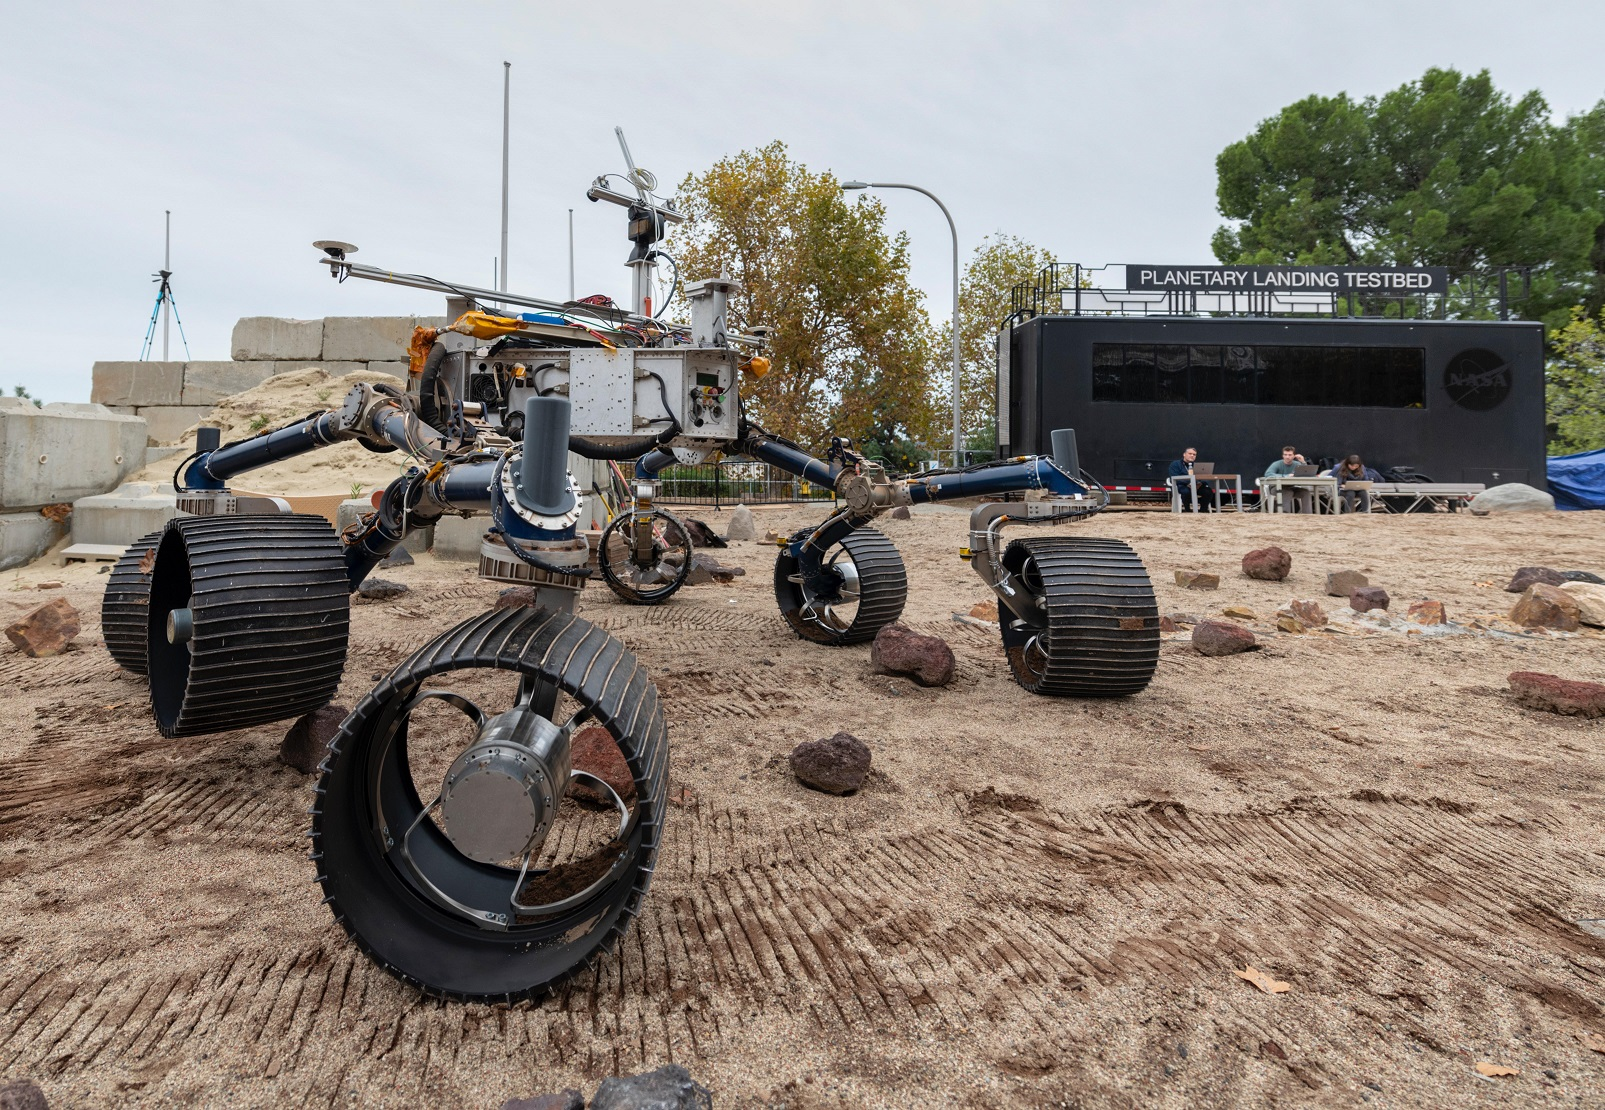 Mars 2020 test rover